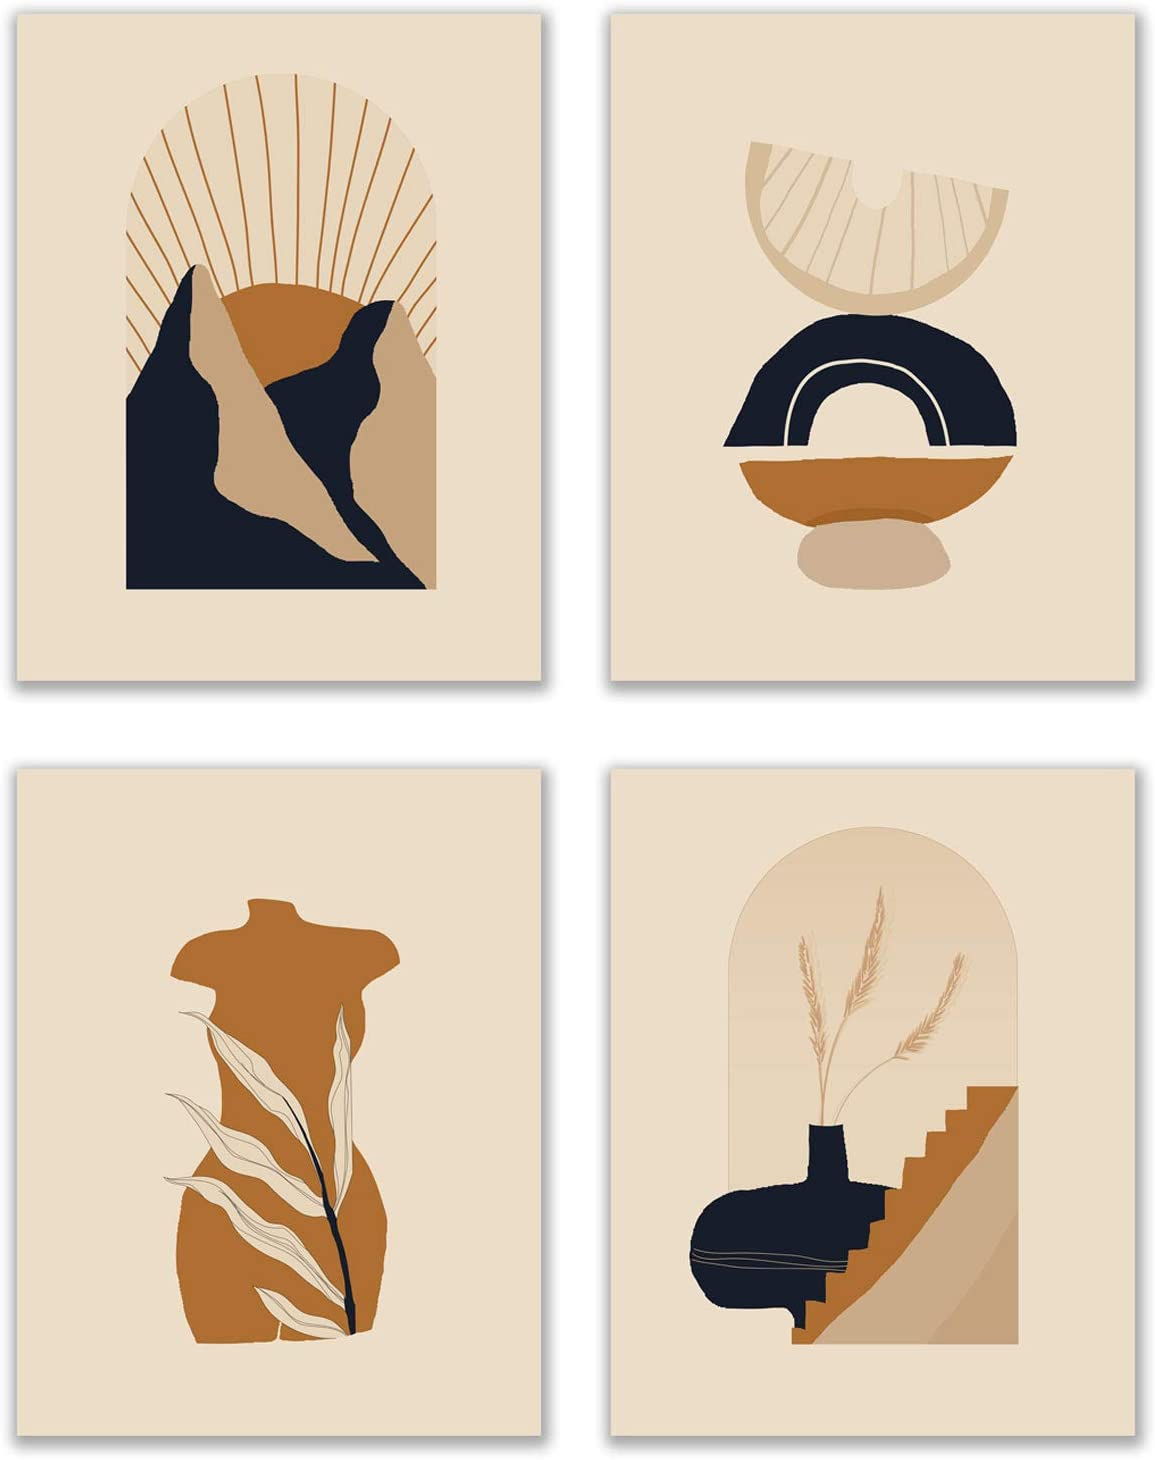 Modern Terracotta Prints - Set of 4 (11x14 Inches) Glossy Boho Abstract Geometric Mid Century Contemporary Minimalist Wall Art Decor - Neutral Yellow Burnt Orange Navy Fruit Floral